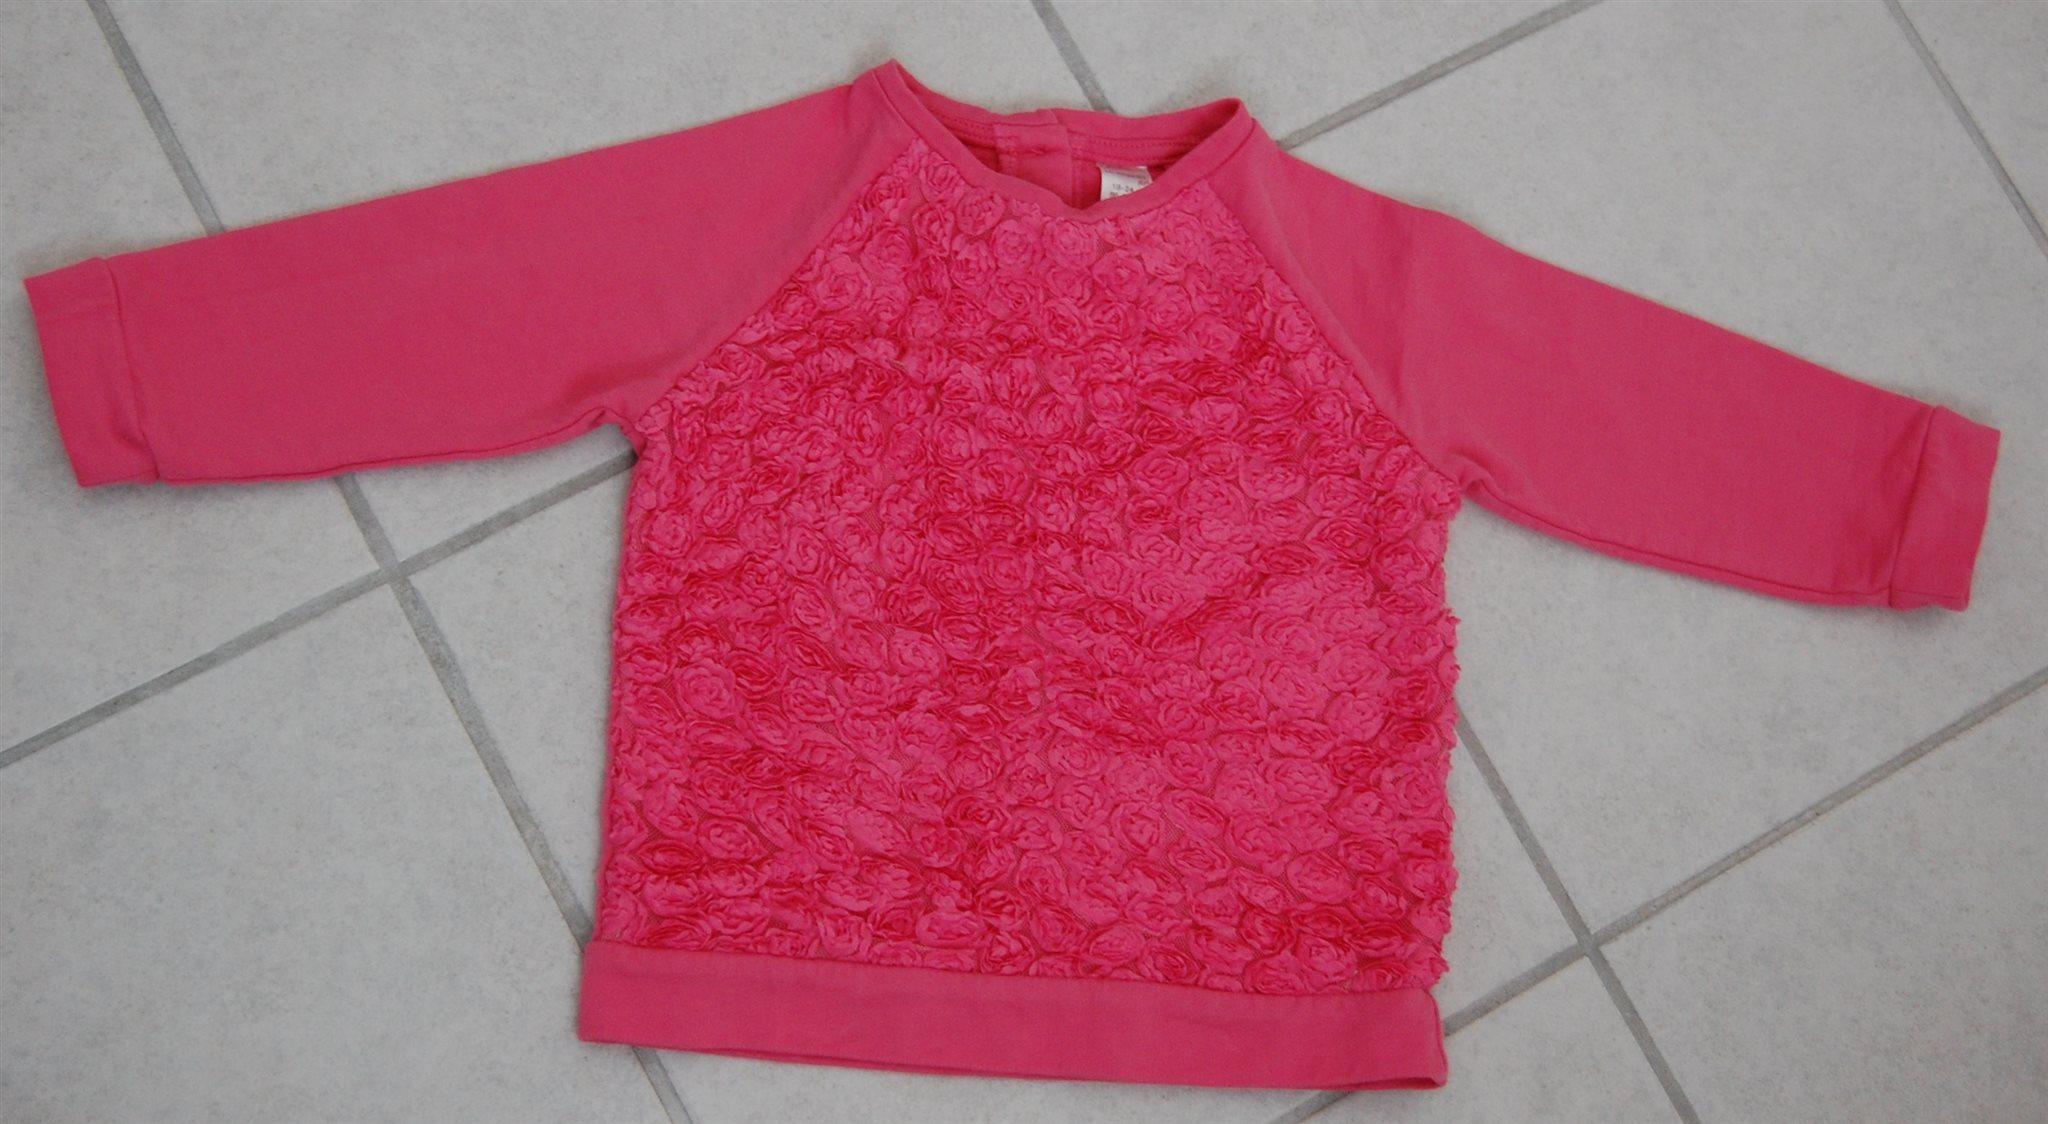 d94b47c6e3 LC Waikiki Mini Baby Girls Roses Top